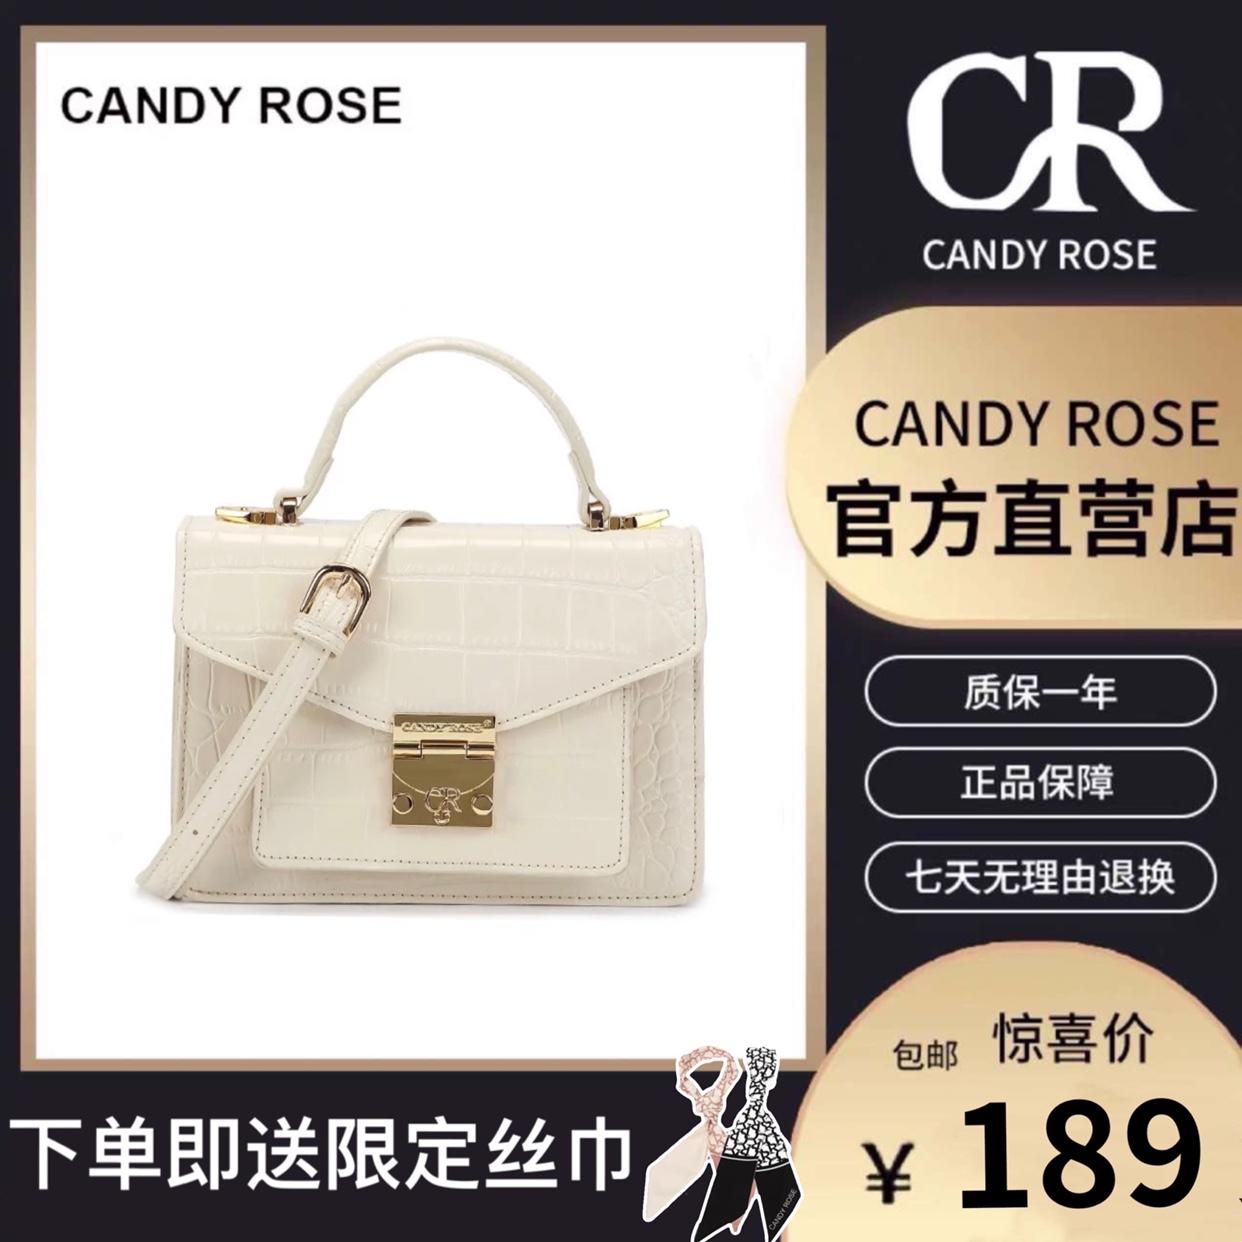 CandyRose CR新款官网斜挎包邮差包手提包鳄鱼纹金属扣夏紫棕白